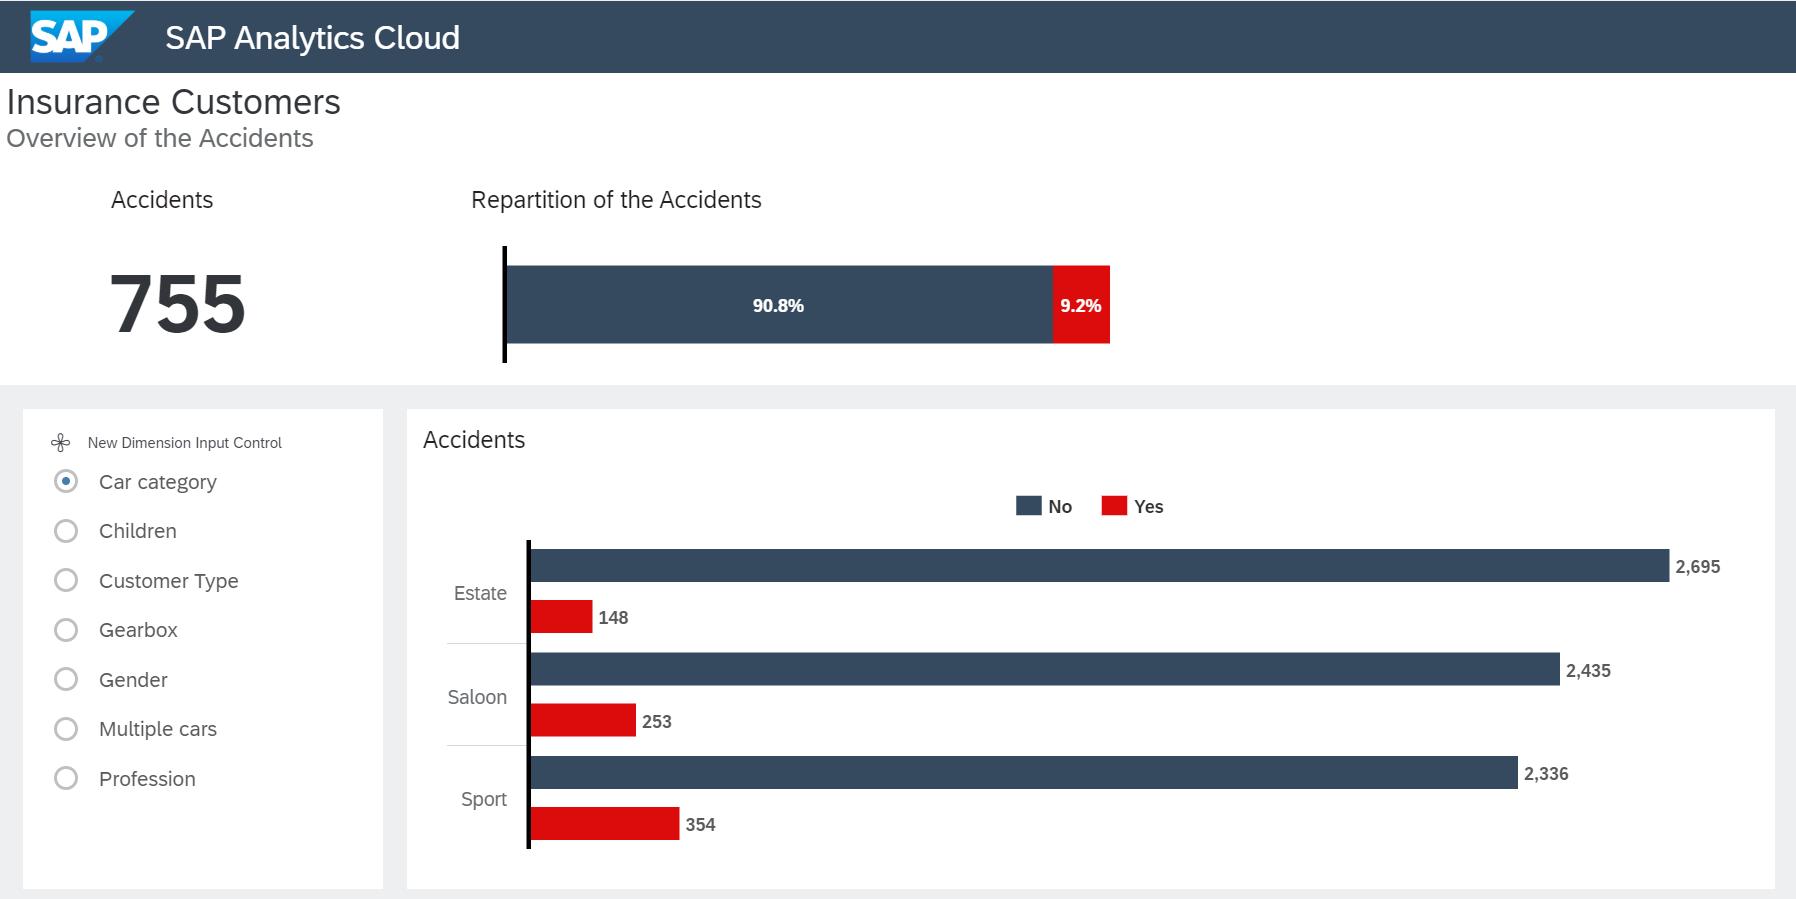 SAP%20Analytics%20Cloud%20Dashboard%20%281%29